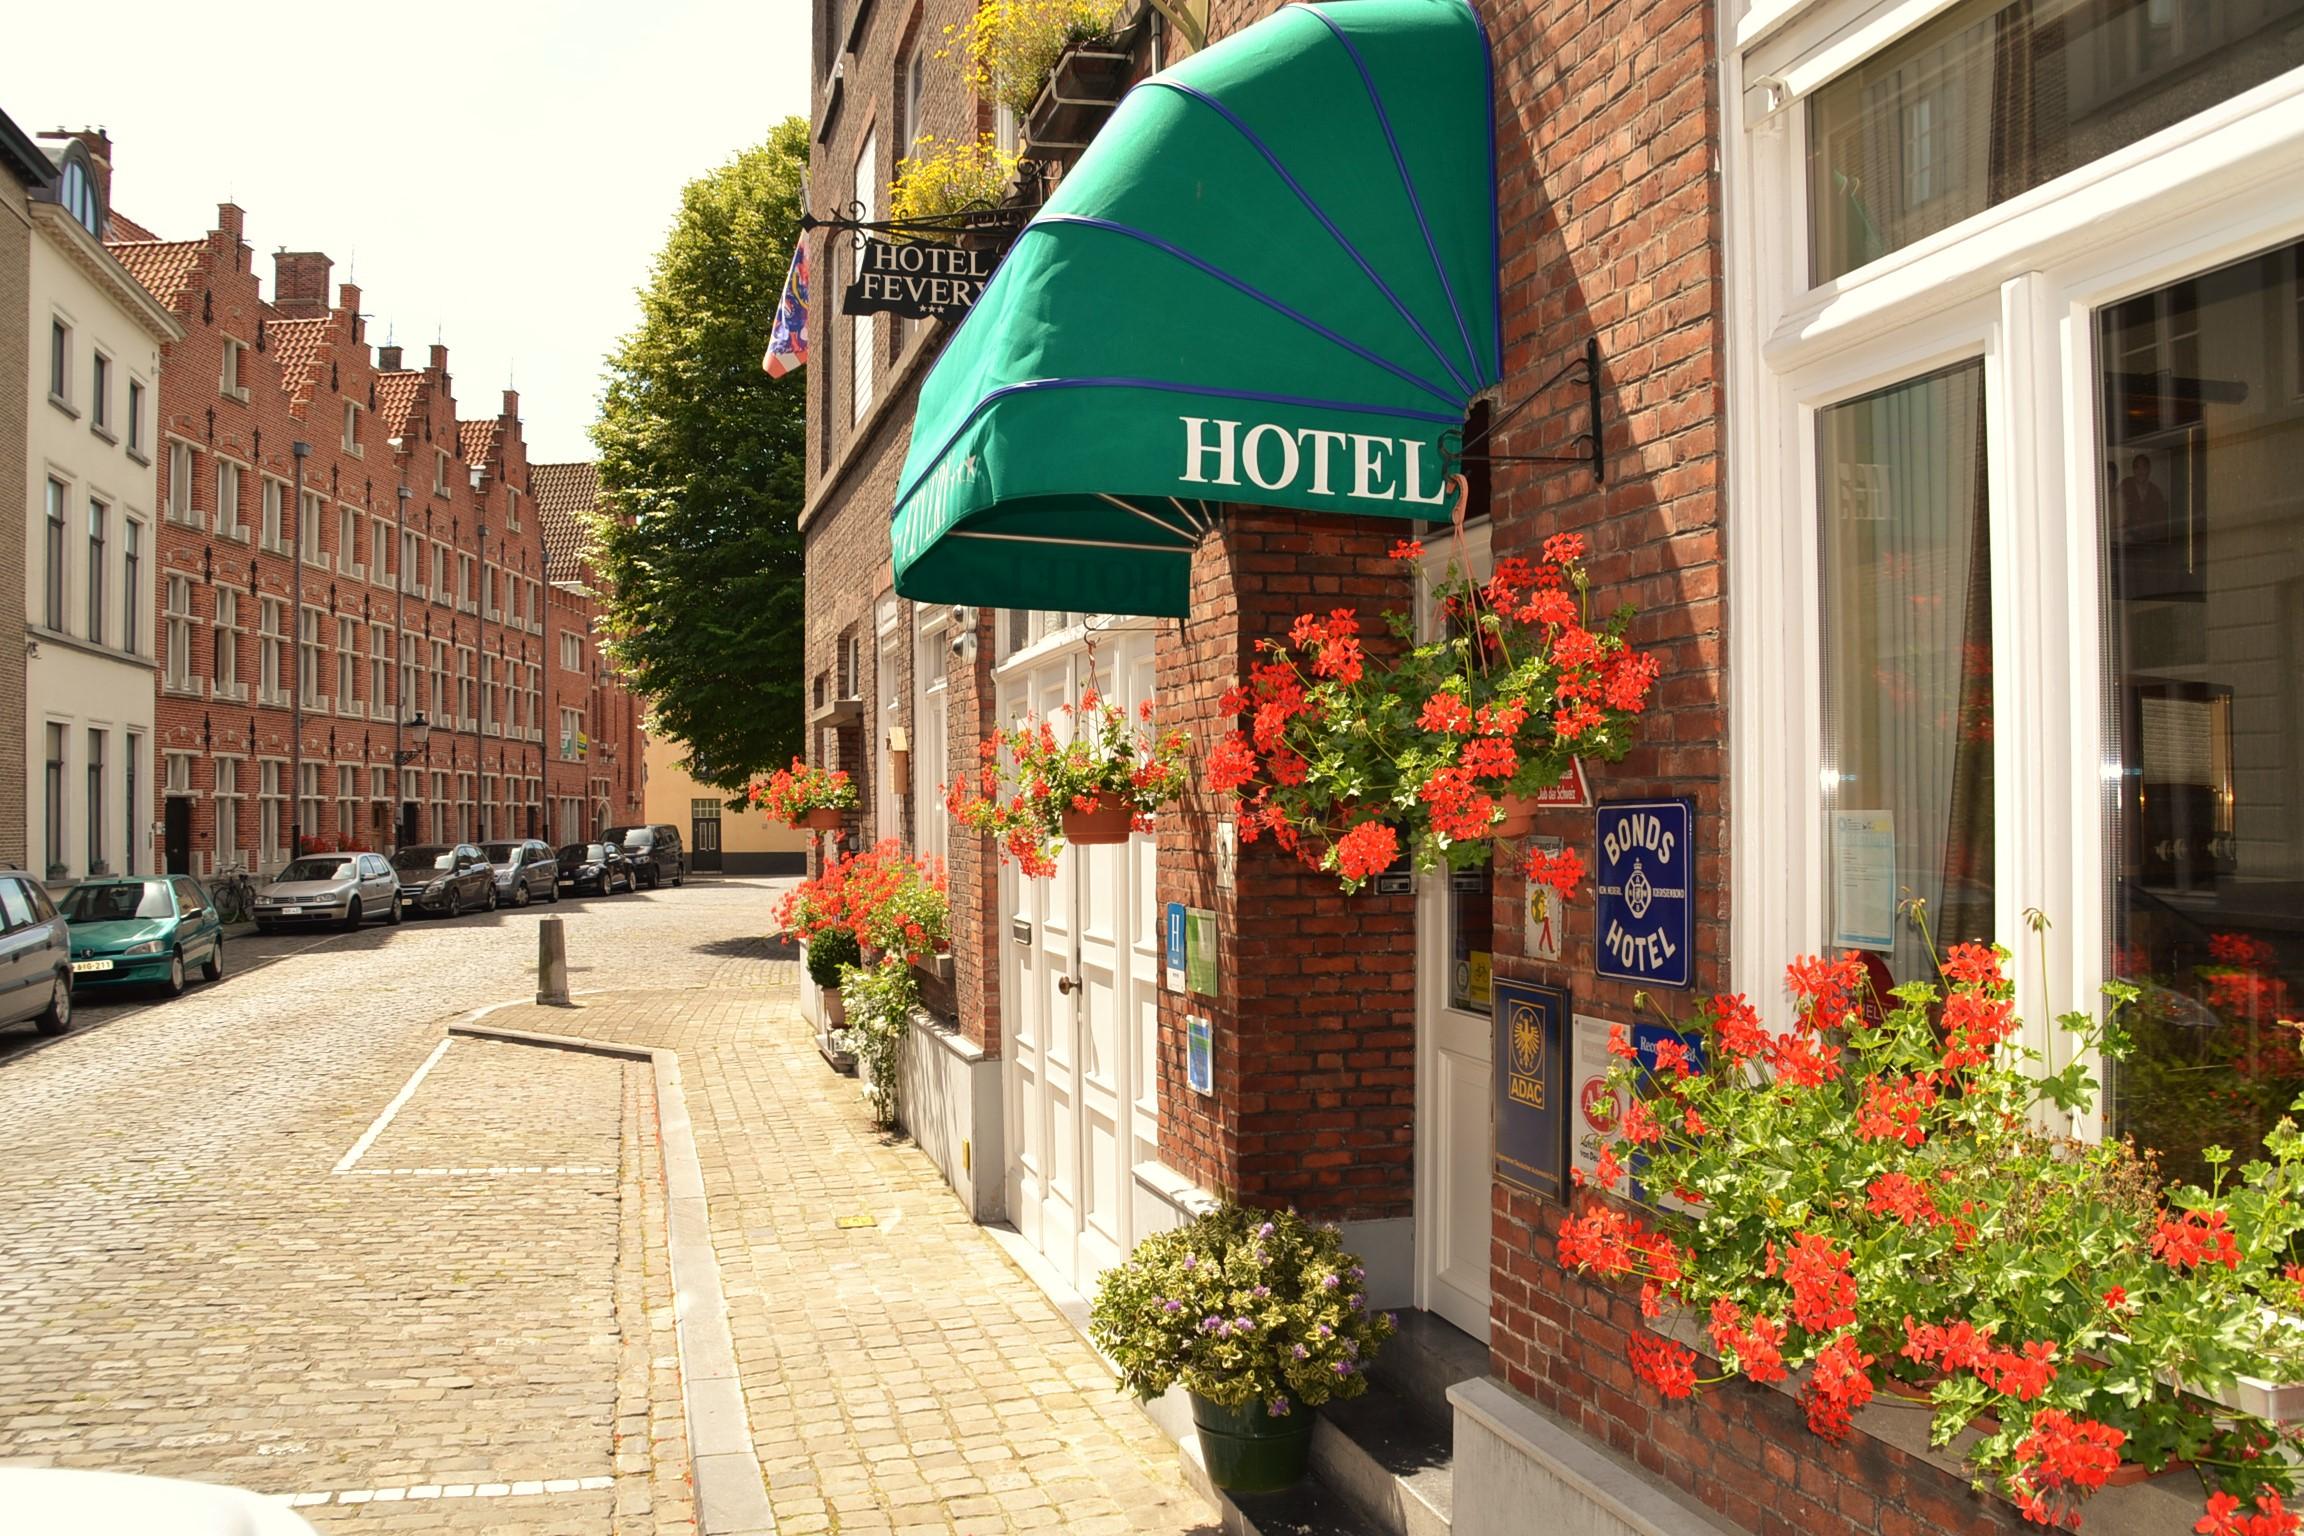 Brugge - Ecohotel Fevery